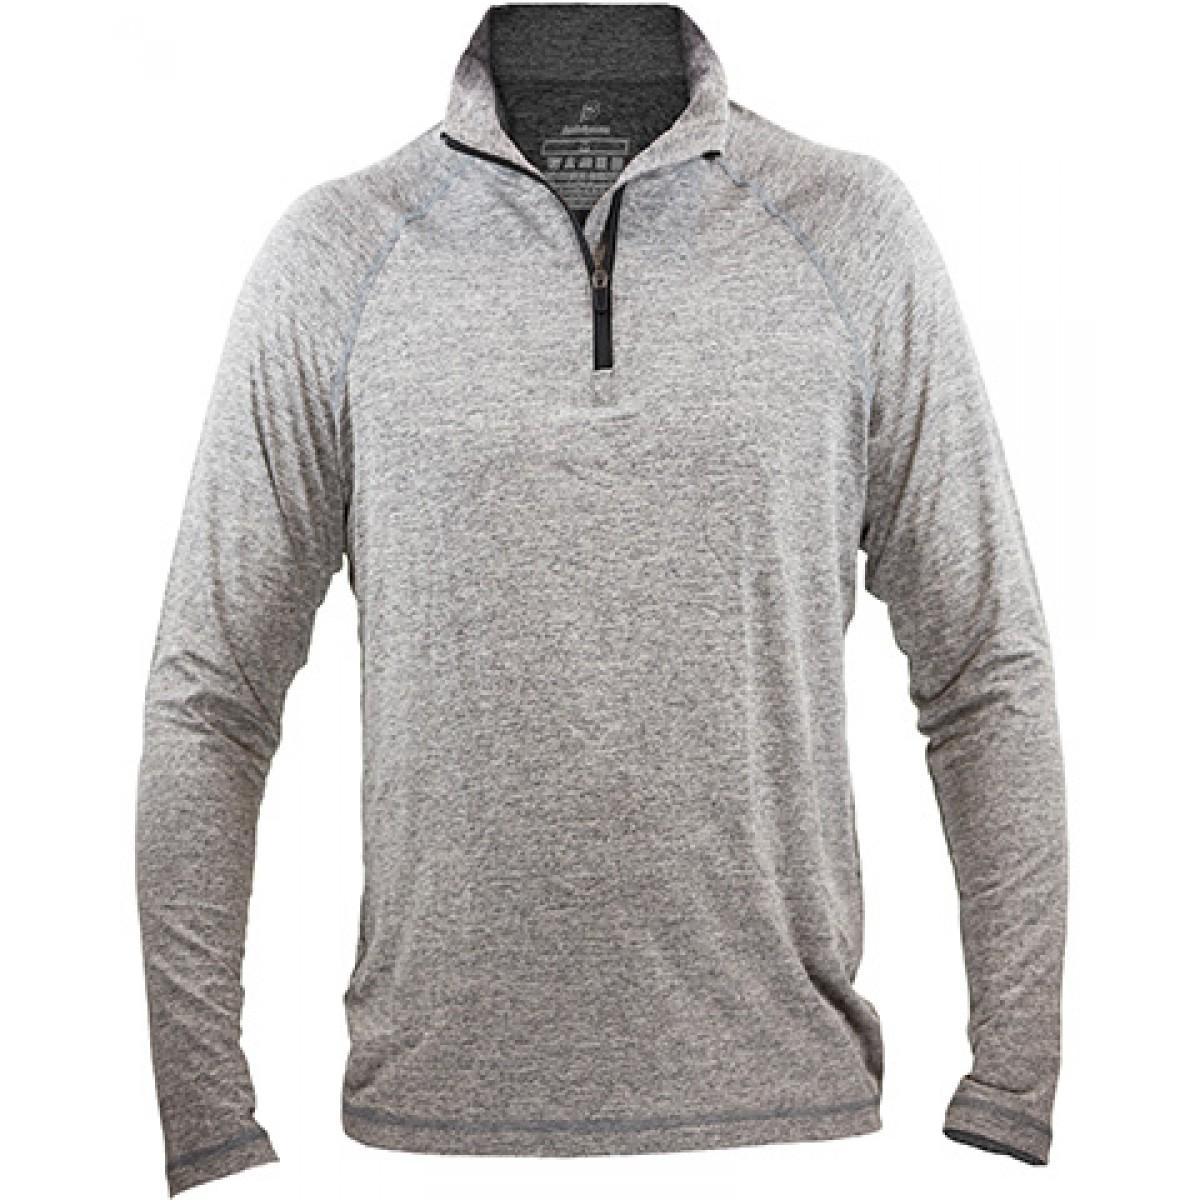 Fine Designs Blend 1/4-Zip Pullover-Gray -XL